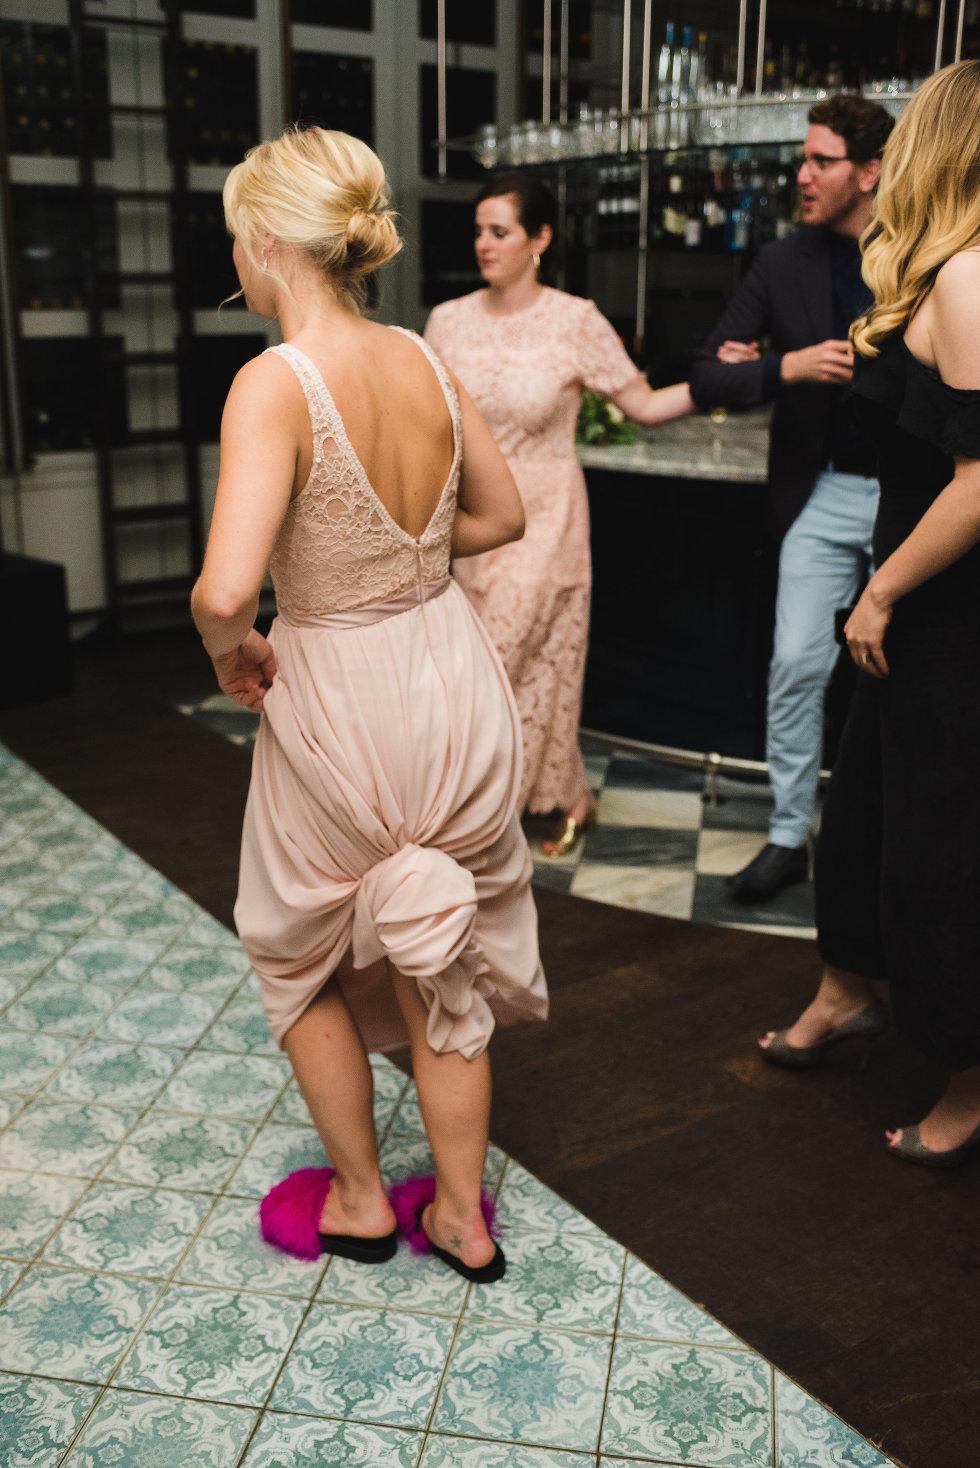 bridesmaid dancing in pink slippers on dance floor Toronto wedding photography